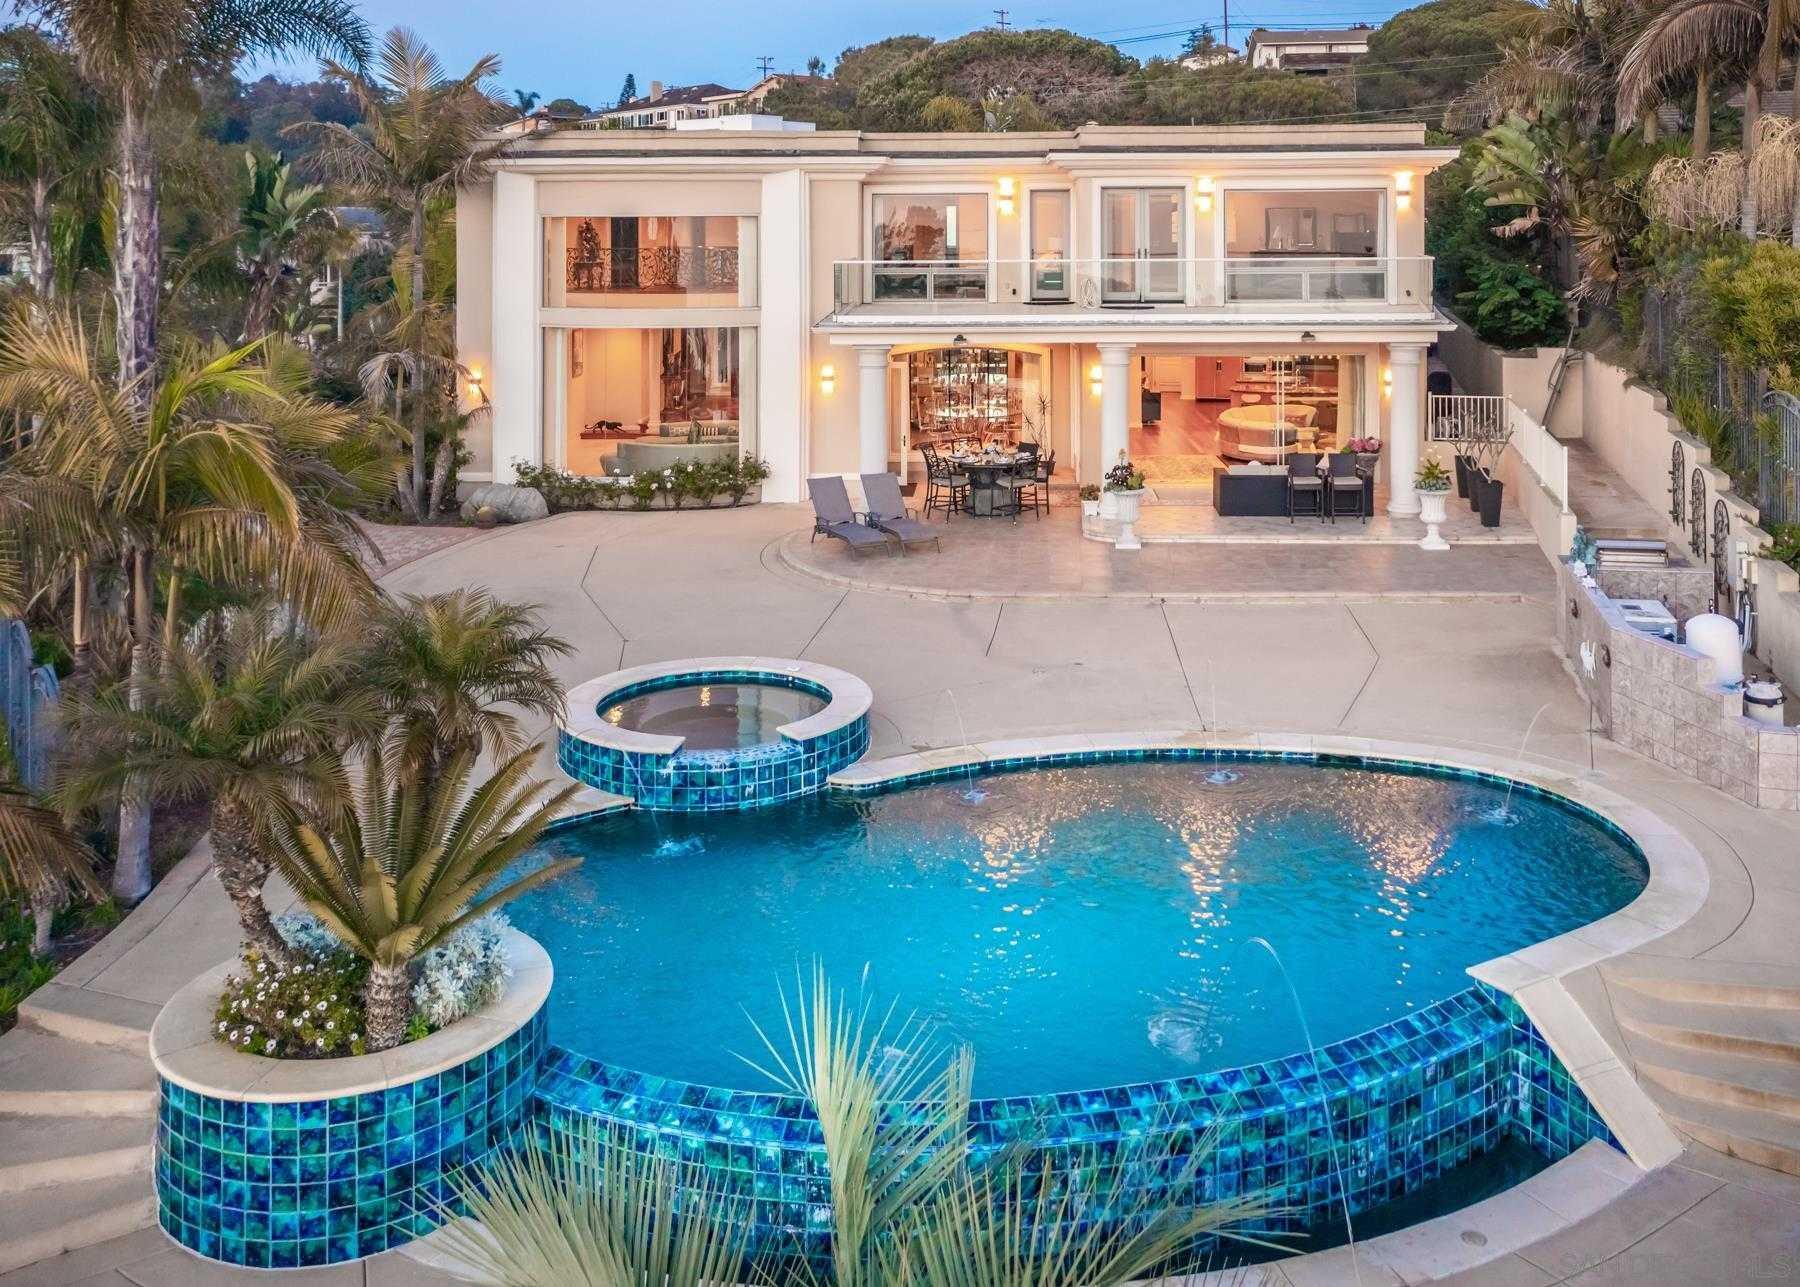 $6,995,000 - 5Br/5Ba -  for Sale in Muirlands, La Jolla